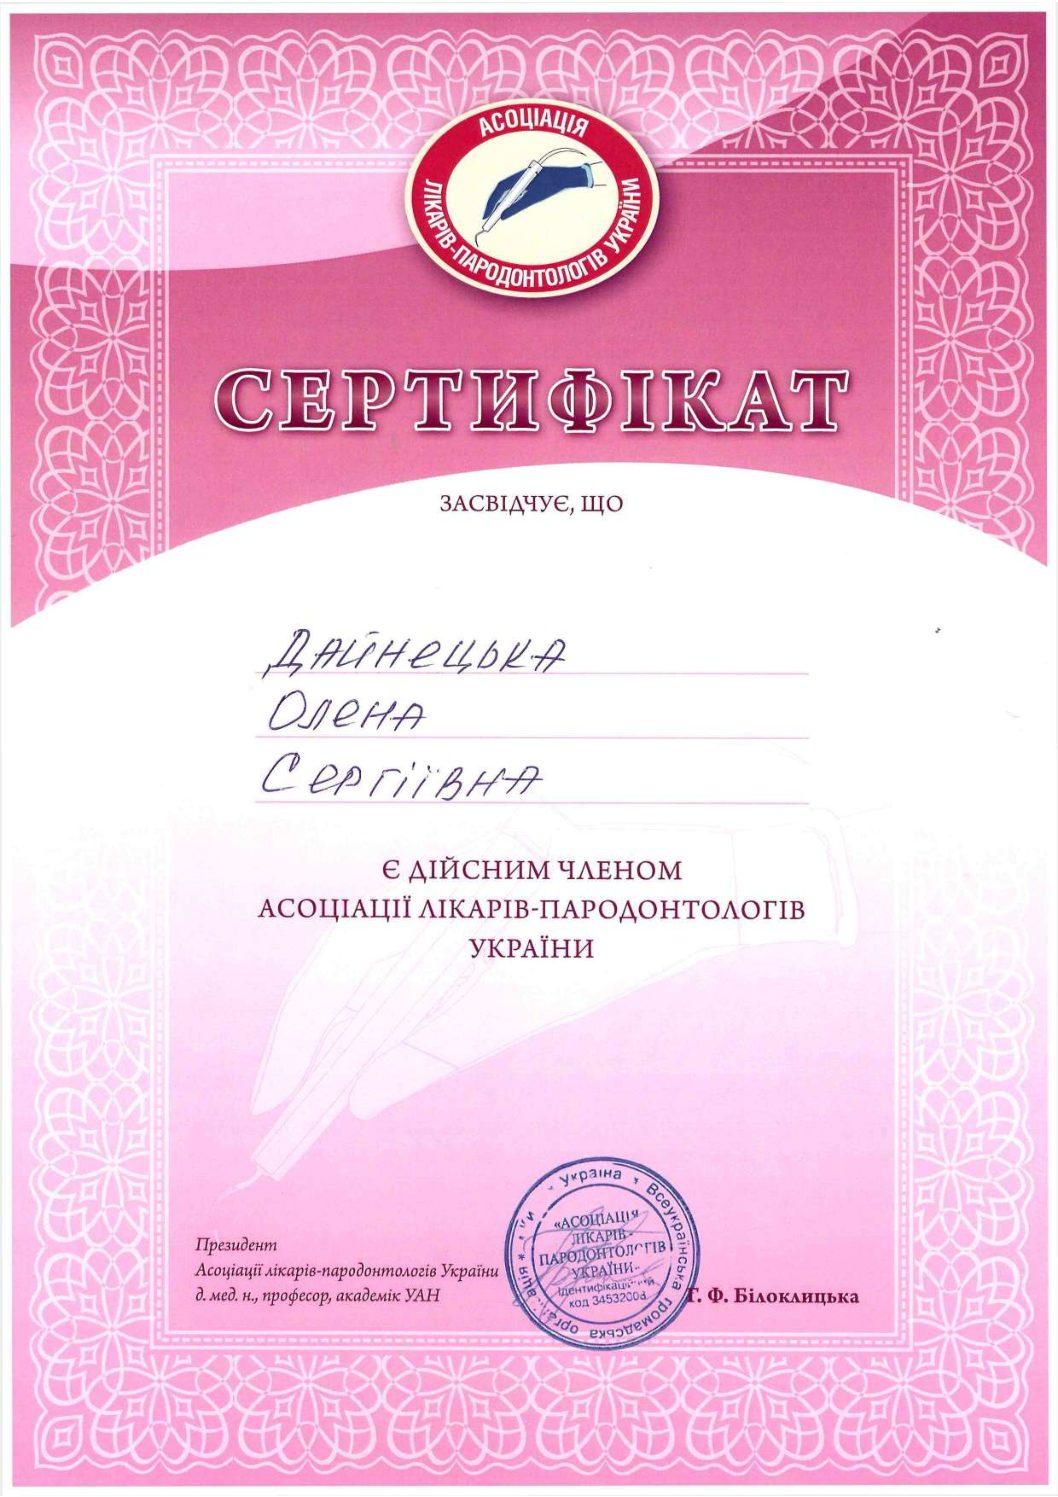 Untitled.FR 9.tif compressed pdf - Олена Дайнецька